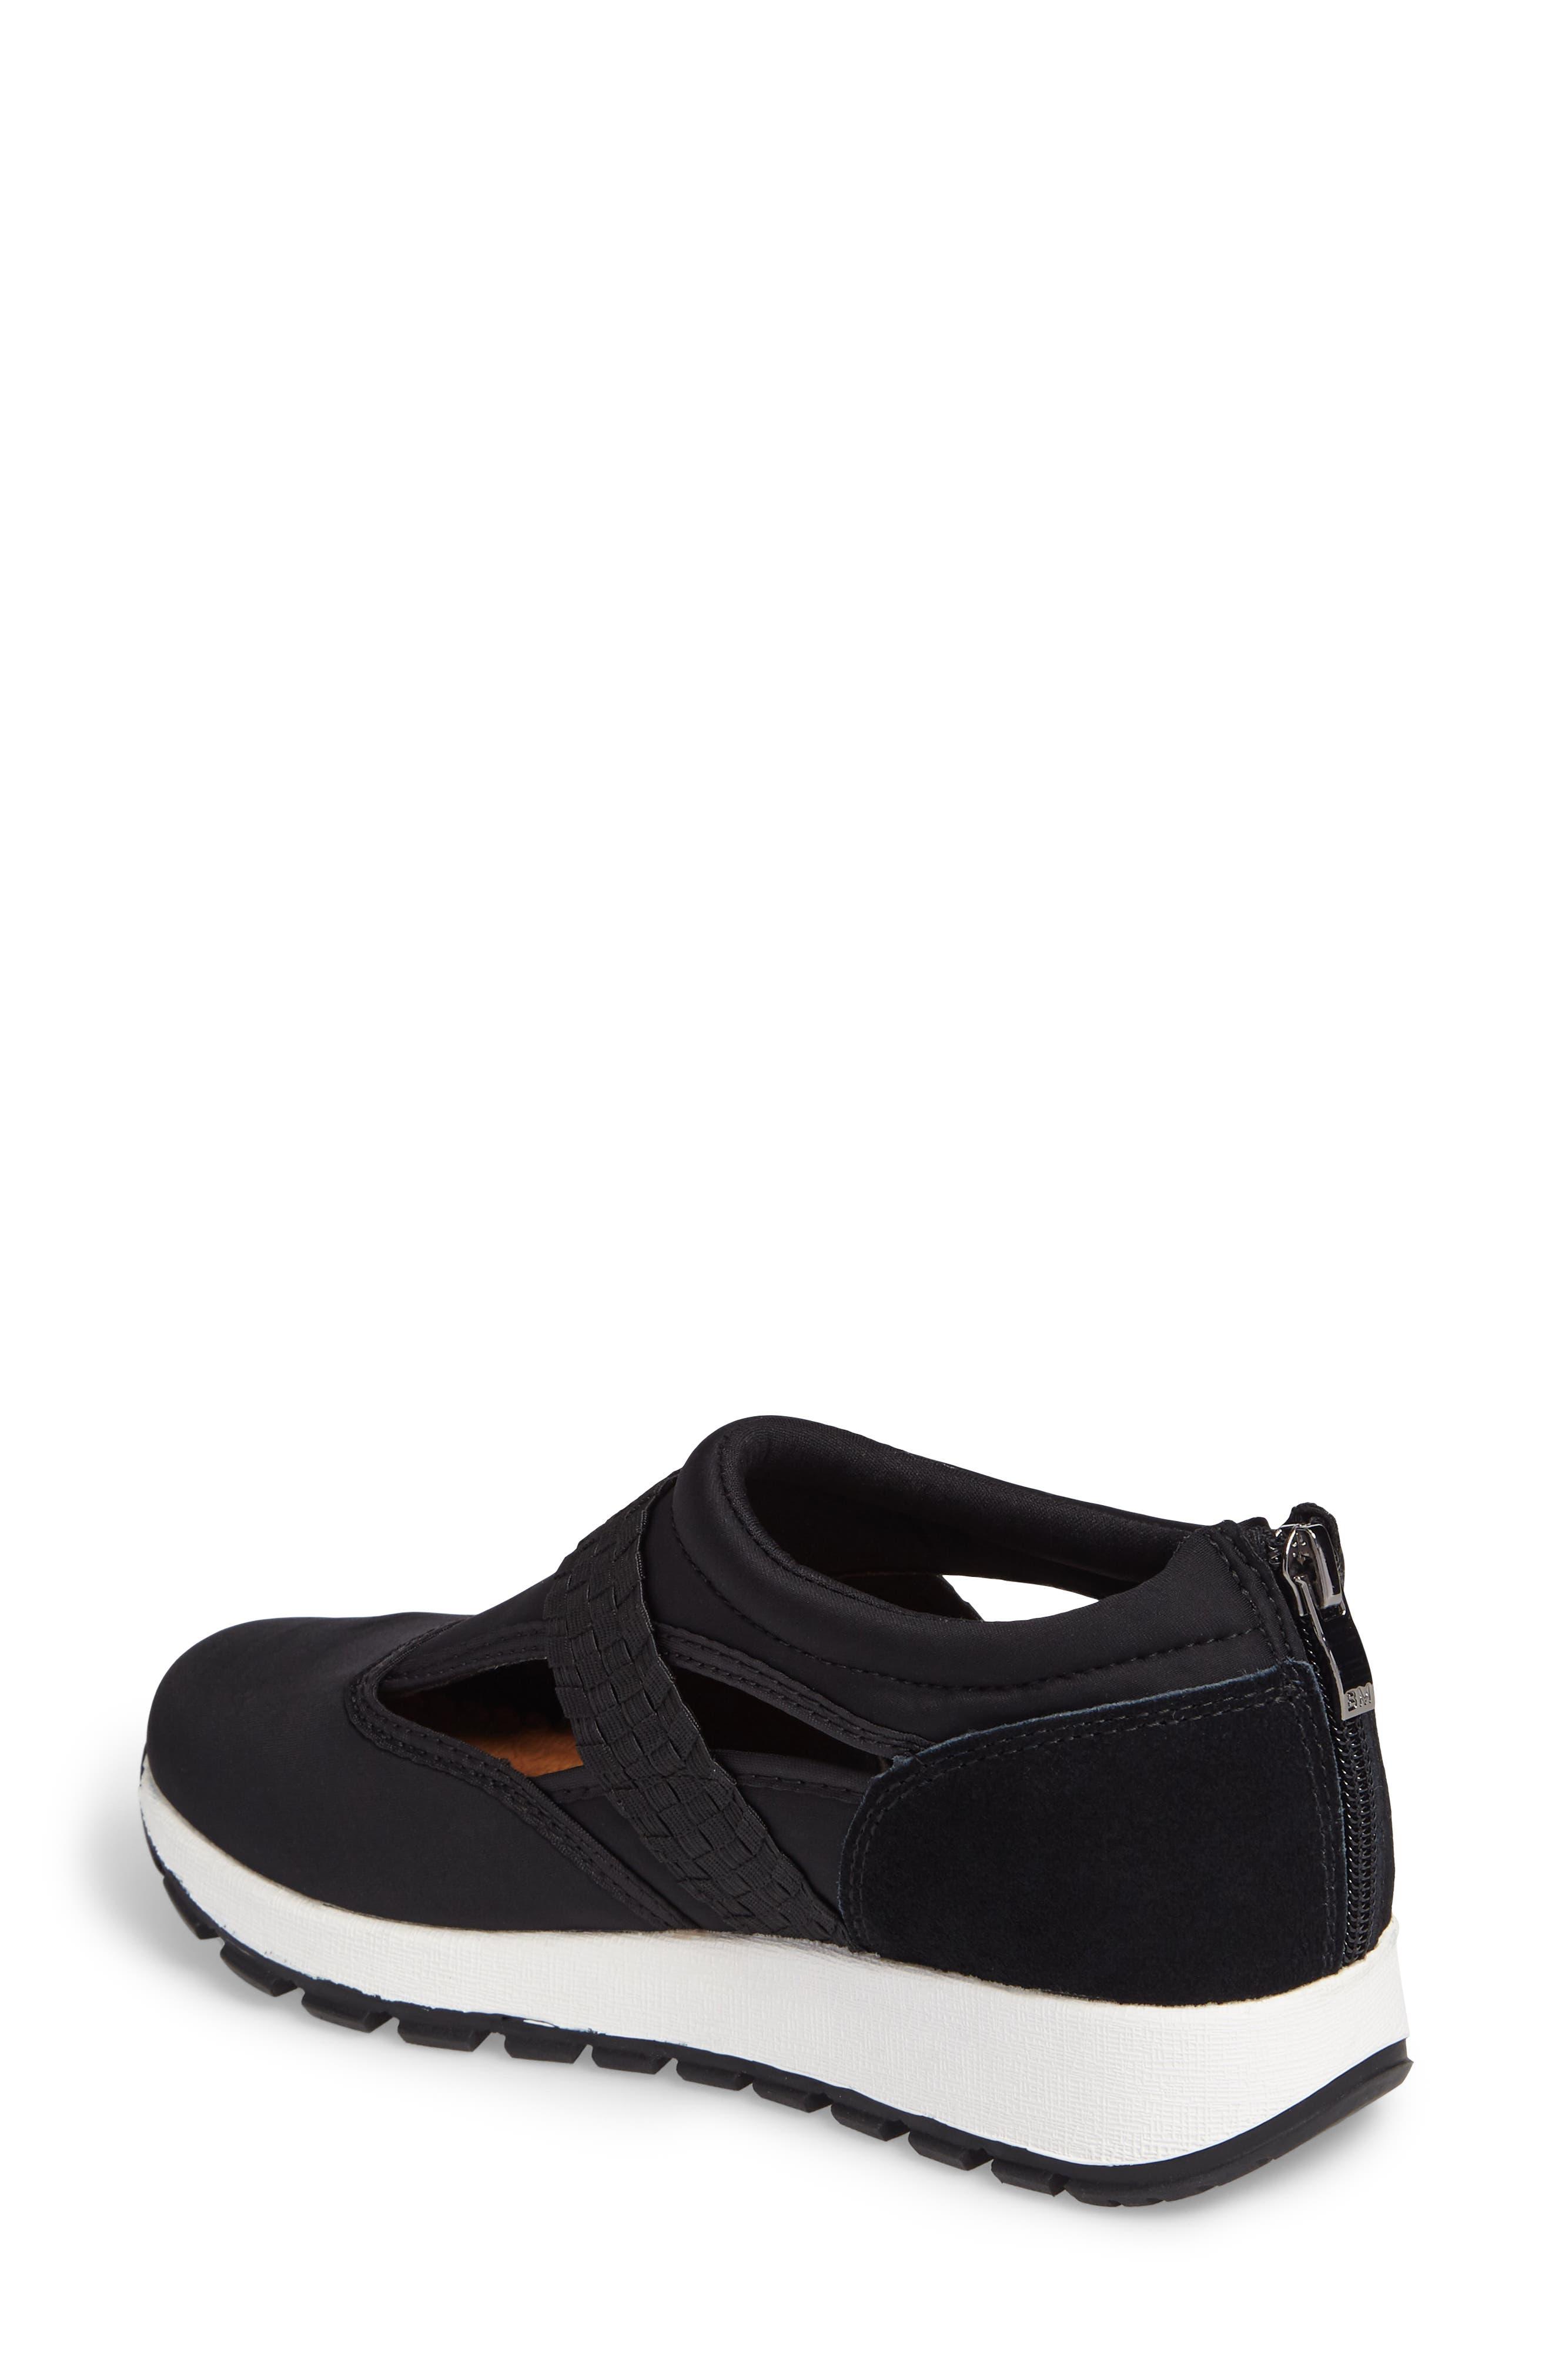 BERNIE MEV., Bernie Mev Janelle Sneaker, Alternate thumbnail 2, color, BLACK FABRIC